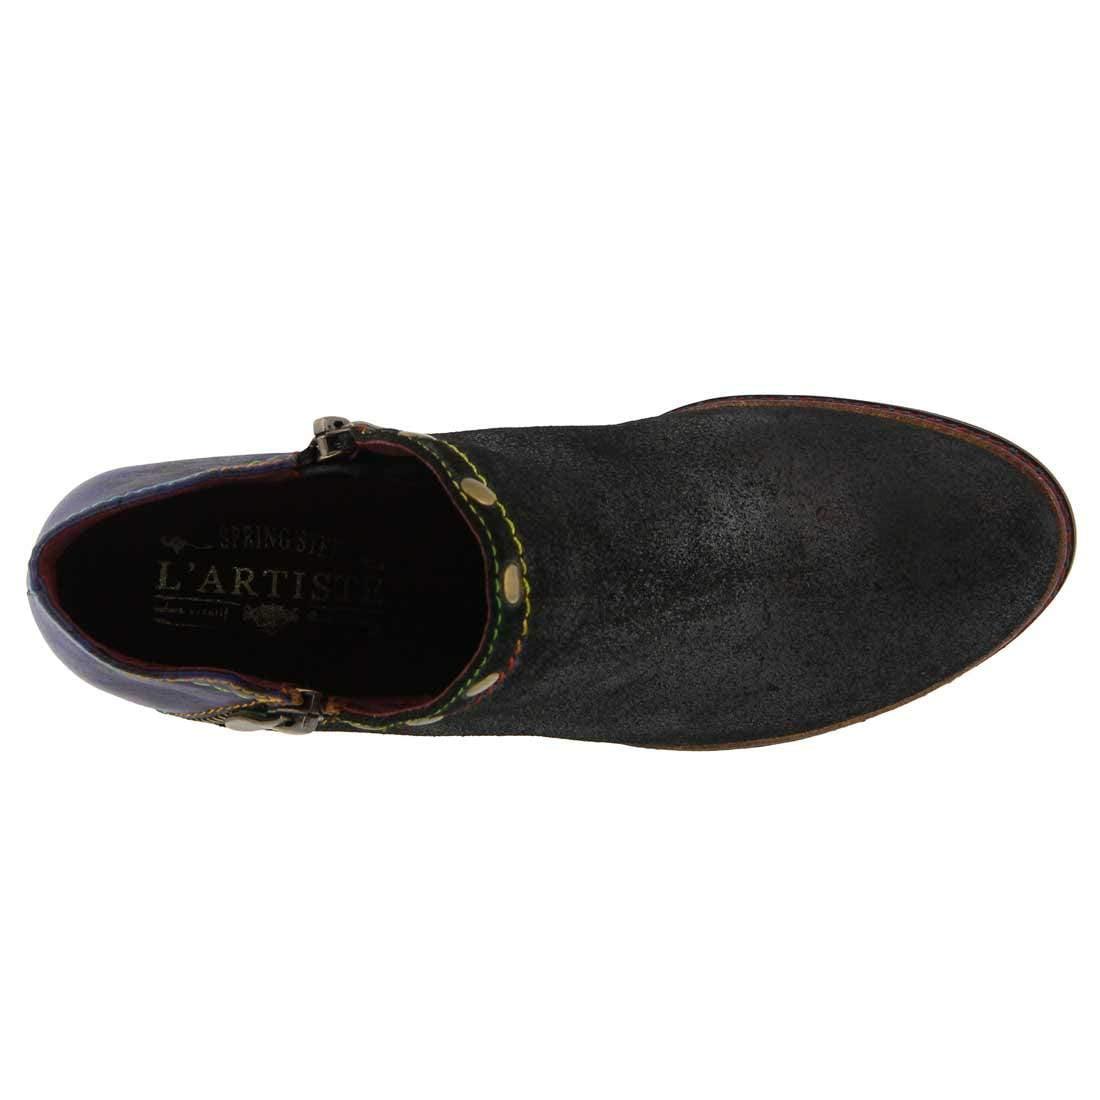 Use-Custom-Brand Womens Toe Sabina Leather Closed Toe Womens Ankle Fashion Boots 7b22ee